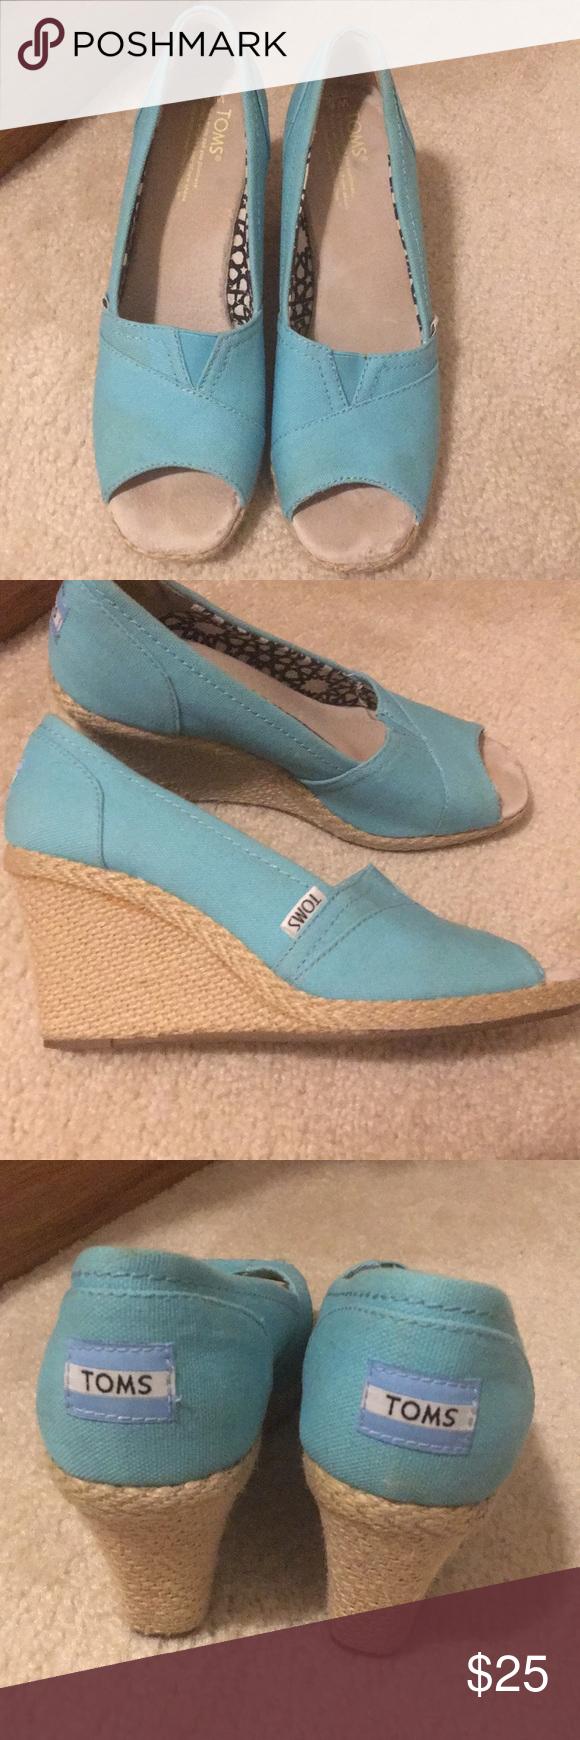 53cd7a87170 Toms women size blue peep toe wedges toms women size blue png 580x1740 Size  toms blue